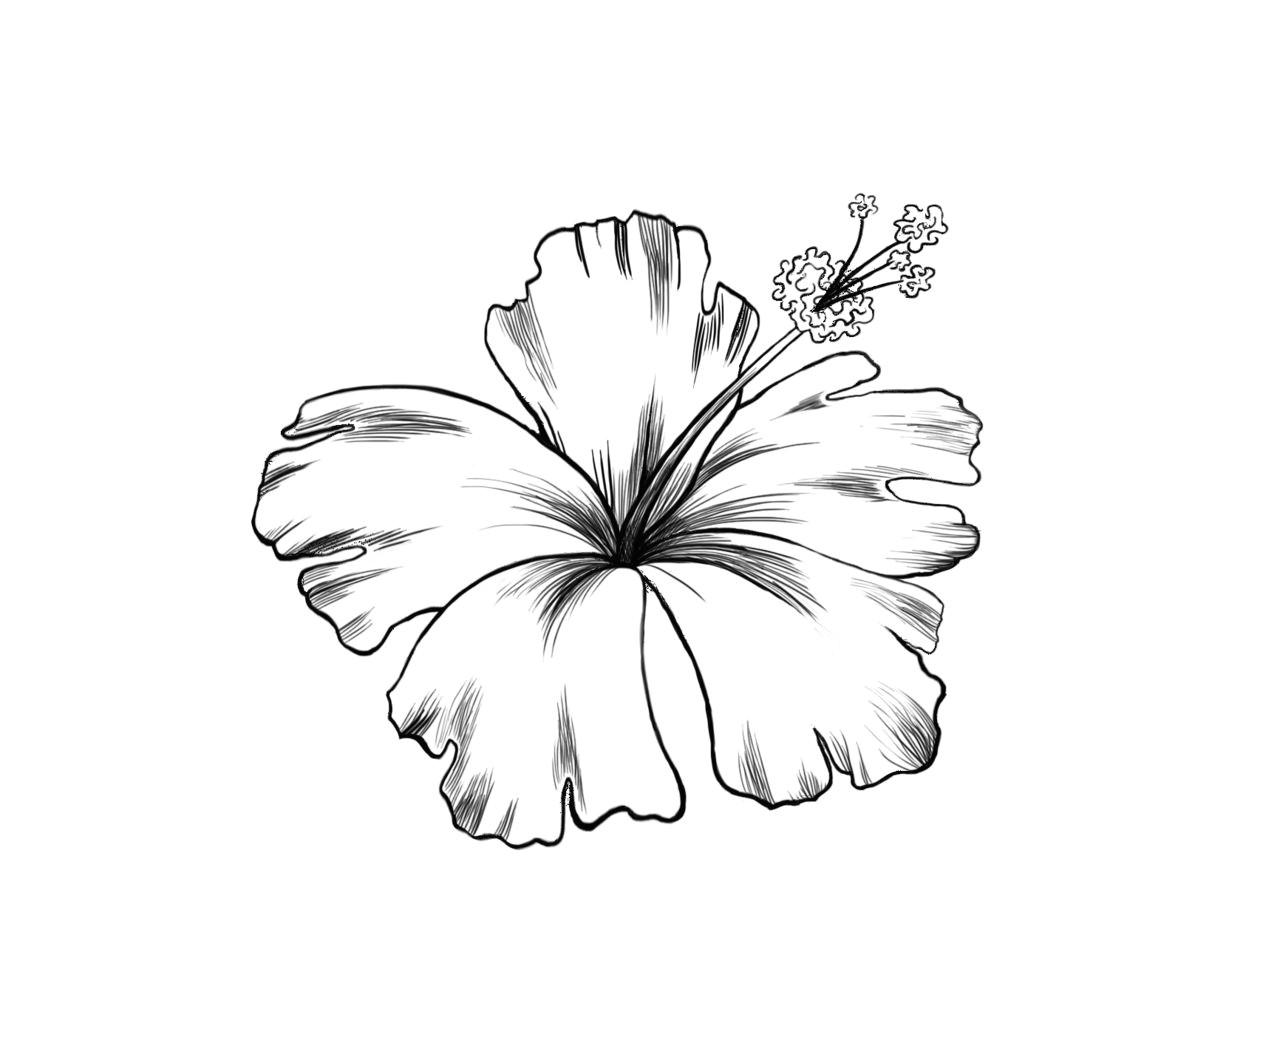 jeremiah dube photo hawaii flower tattoos hibiscus flower tattoos hawiian flower tattoo